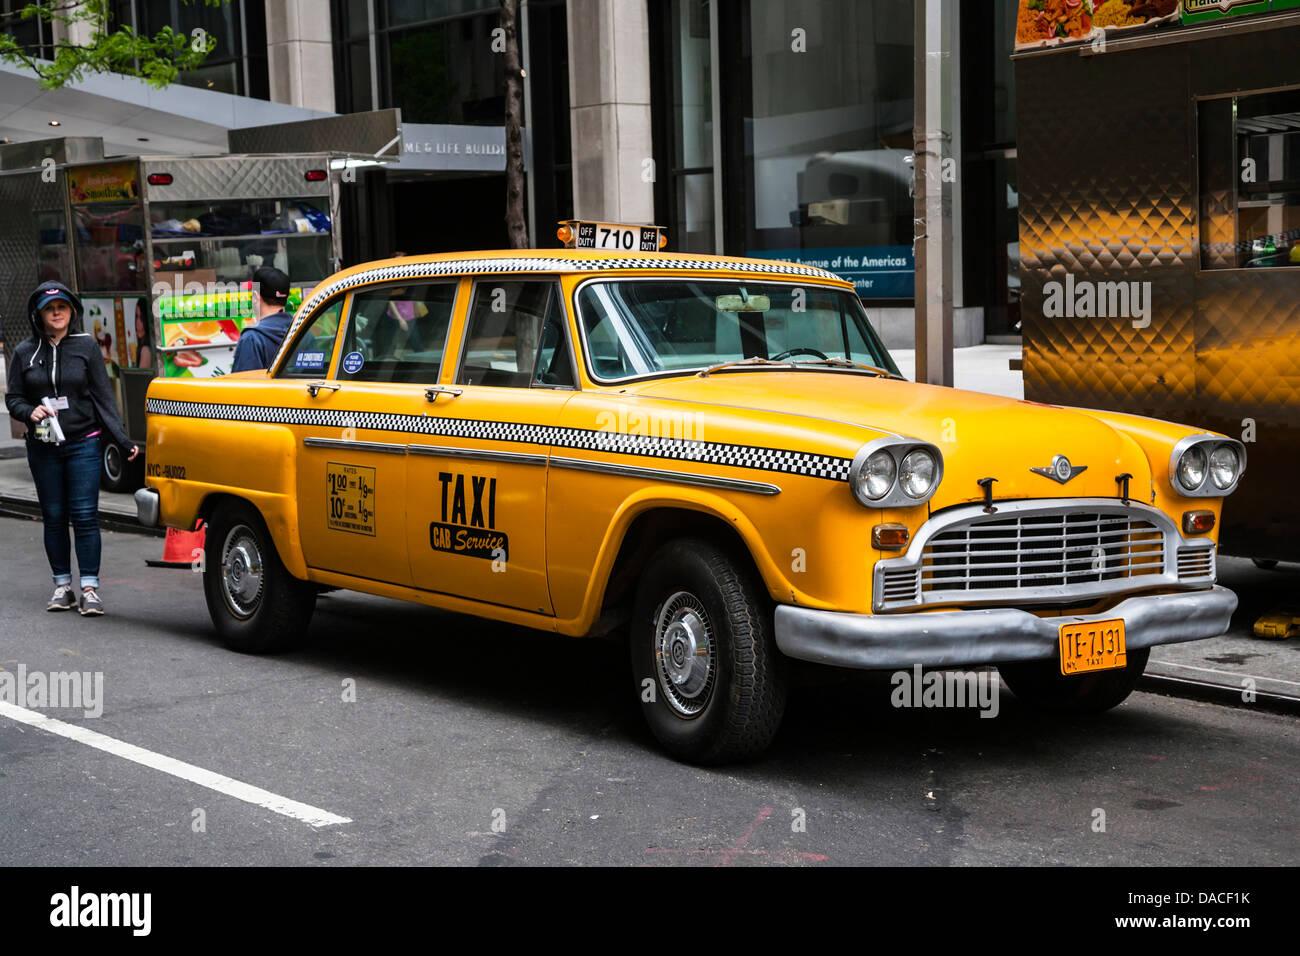 Vintage gelb New York Taxi, NYC, USA. Stockbild